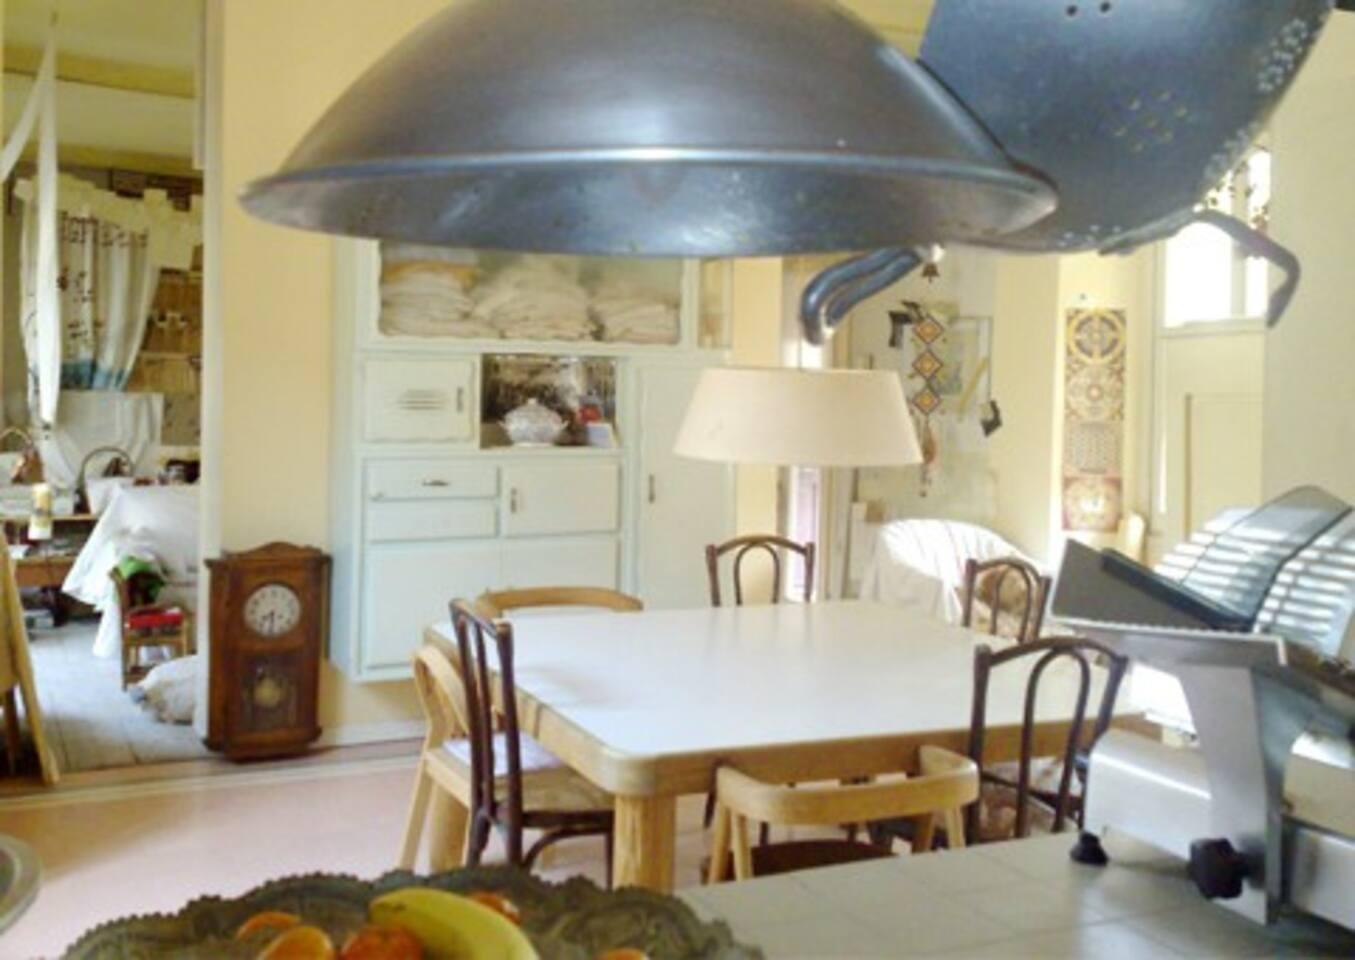 sala da pranzo vista dalla cucina